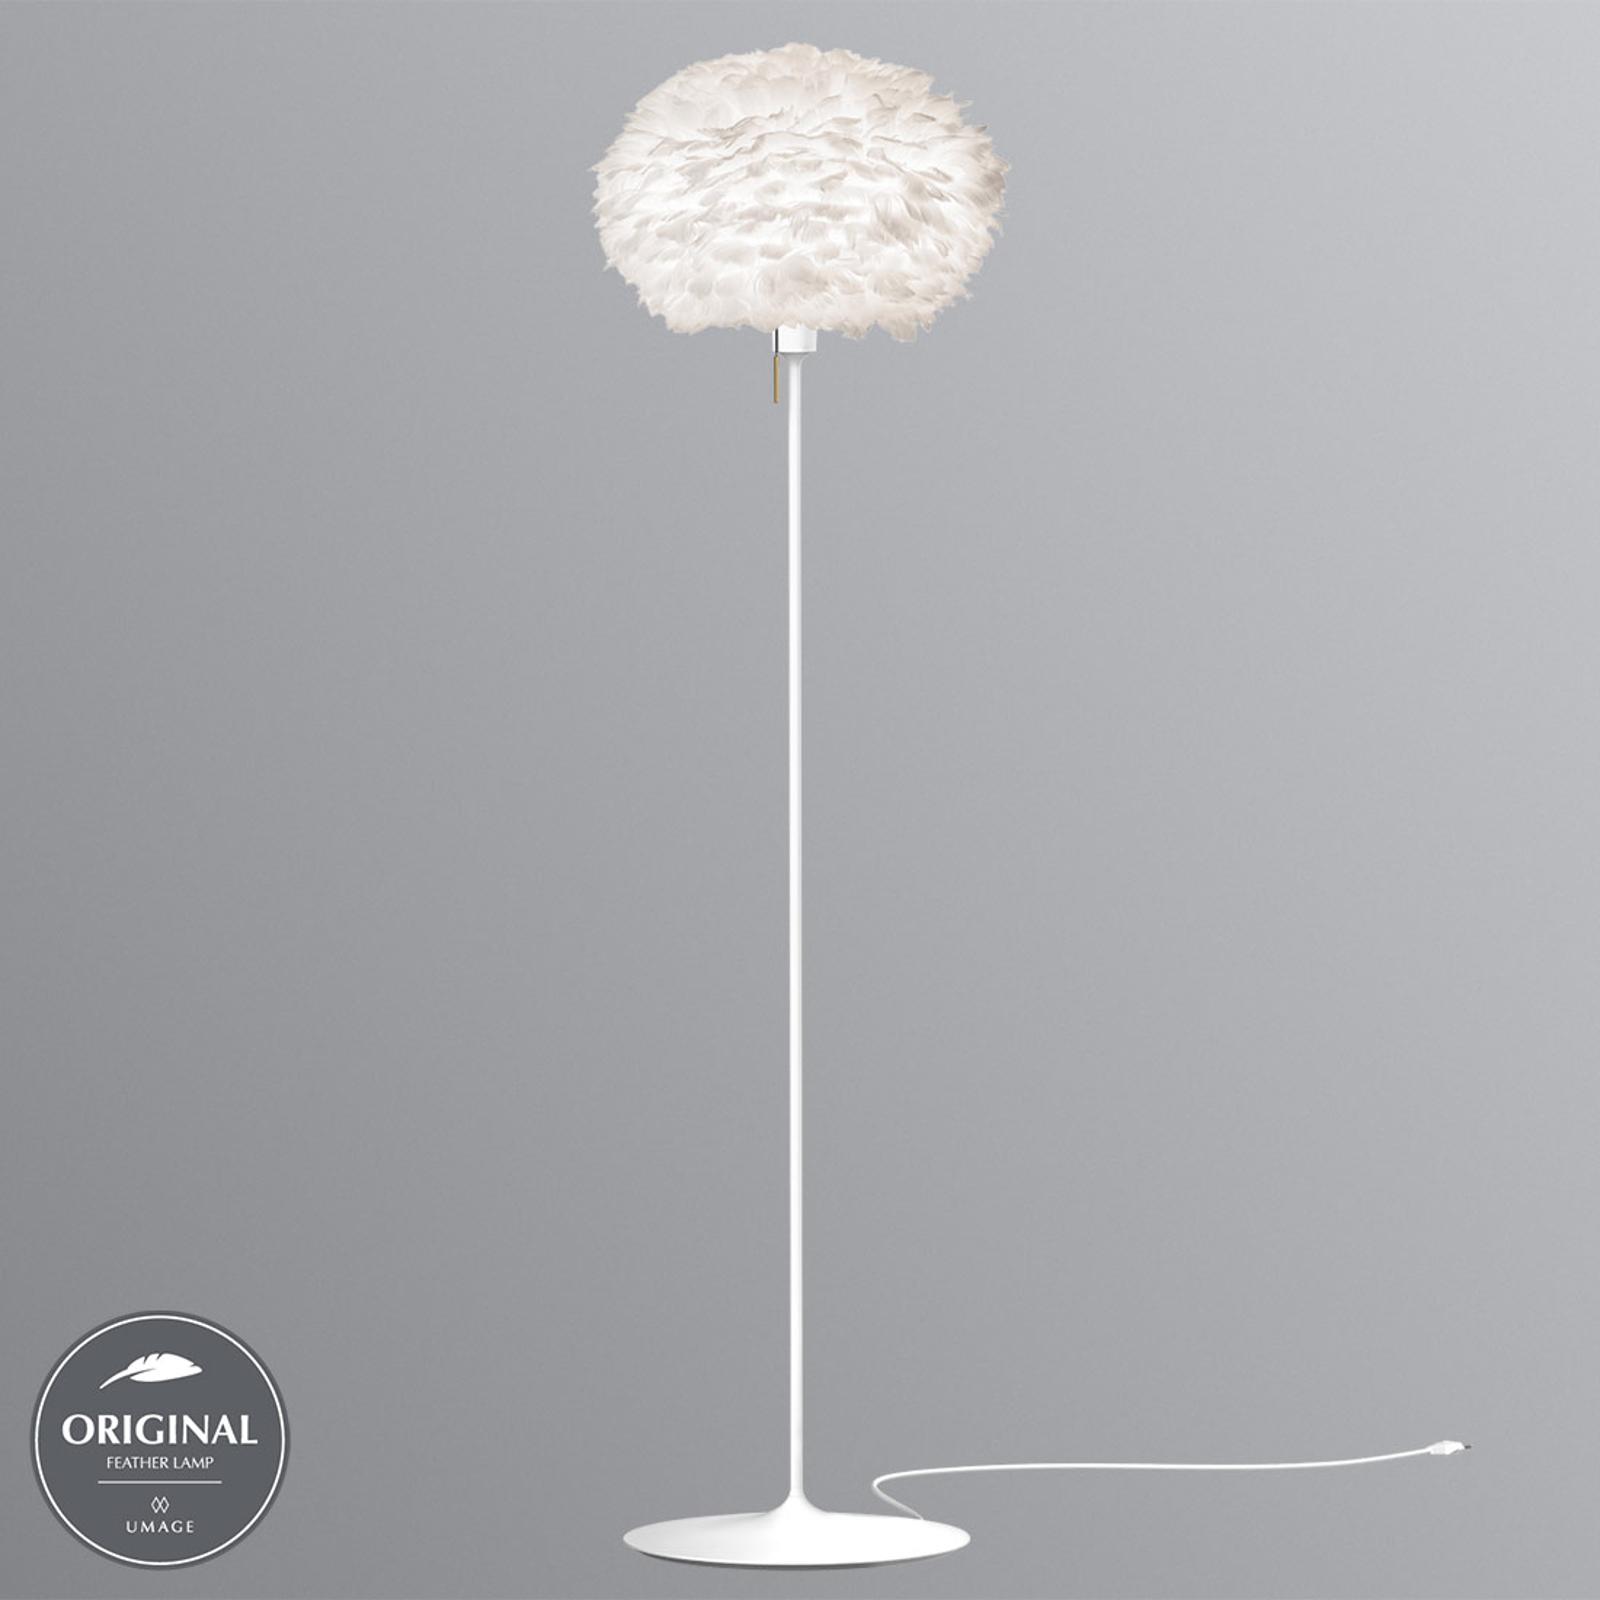 UMAGE Eos medium standerlampe i hvid